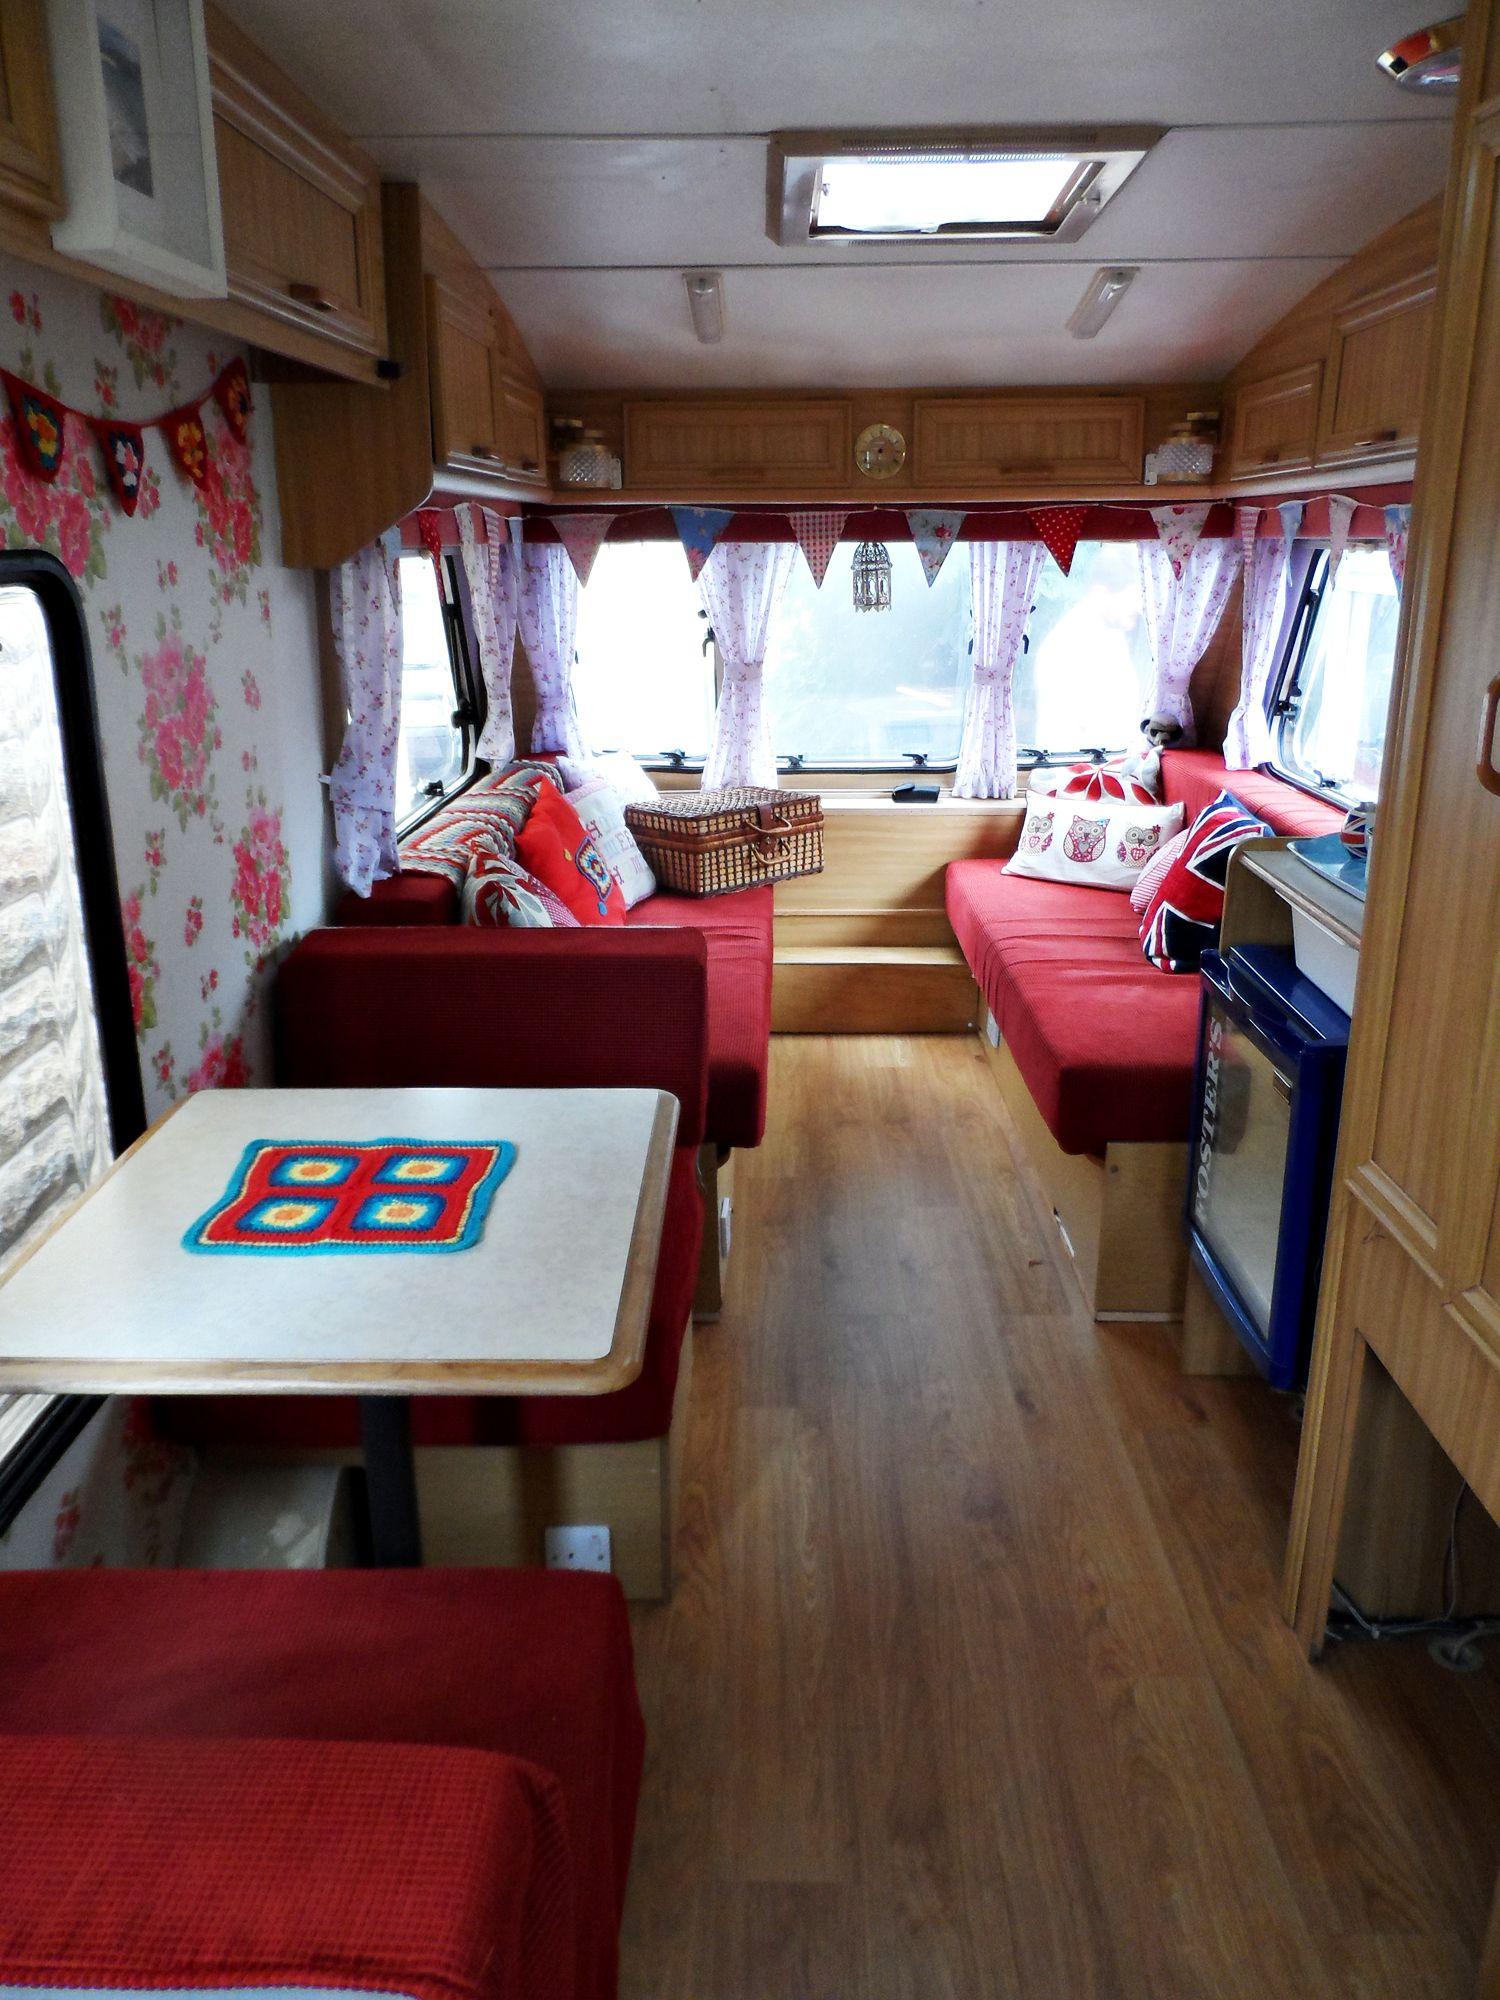 Caravan Makeover Travel Trailers Pinterest Caravan Makeover Caravan Ideas And Camping